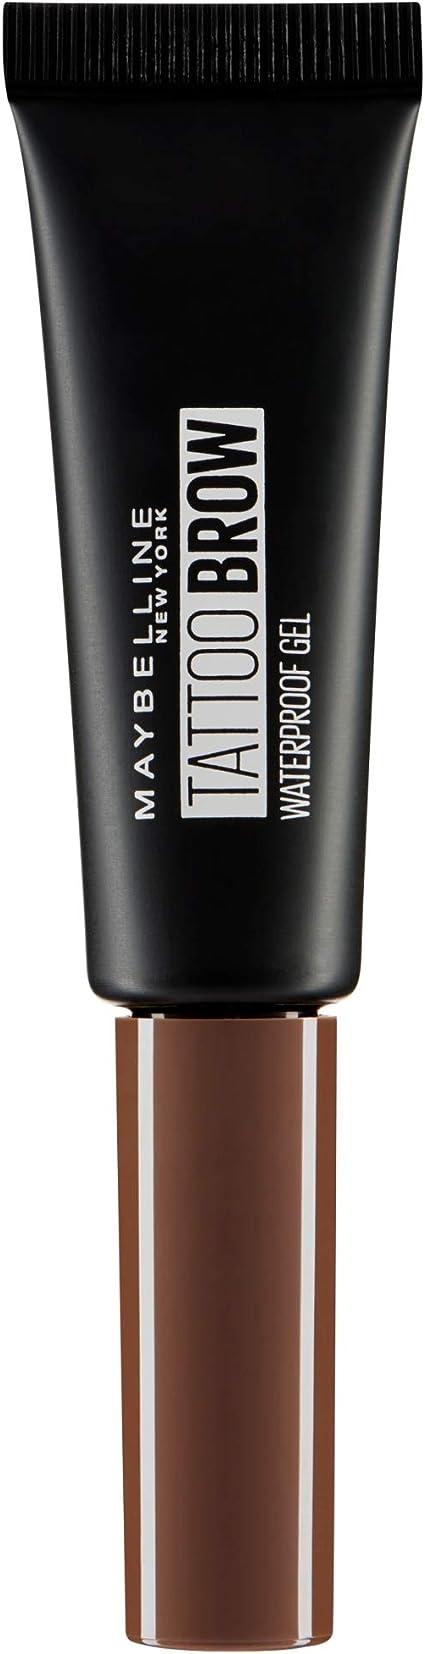 Maybelline New York - Gel à Sourcils Waterproof - Tattoo Brow ...